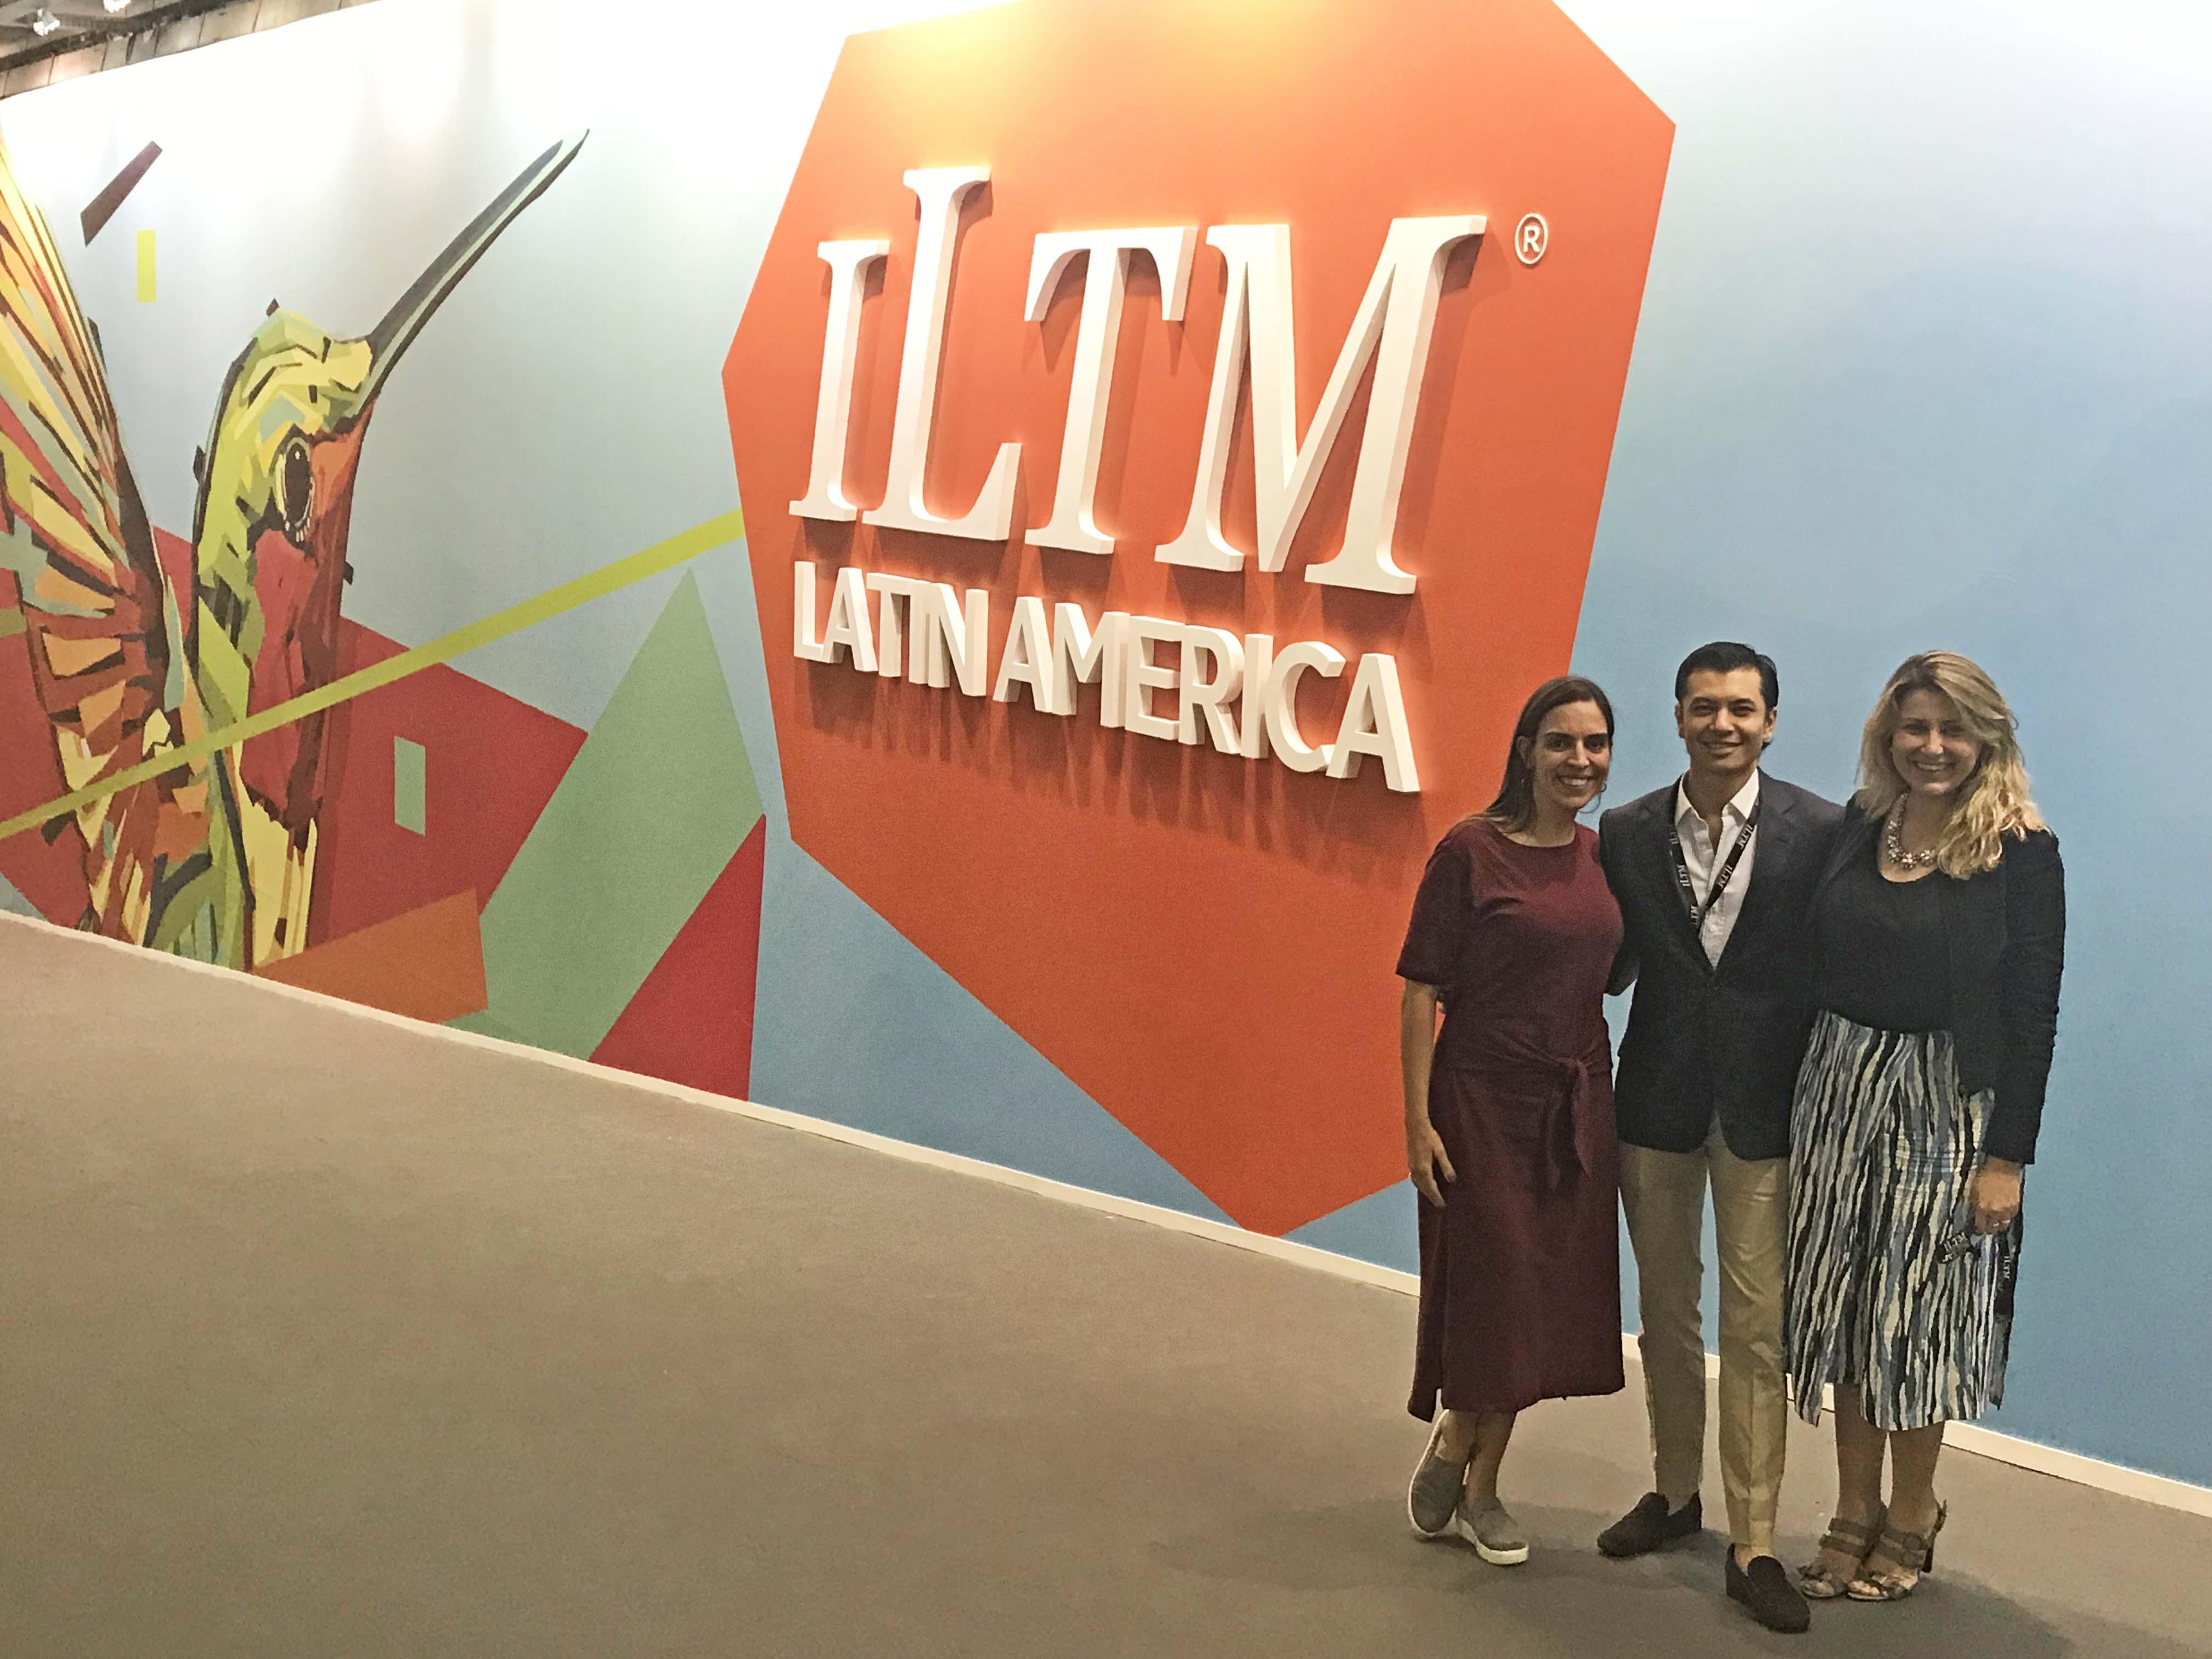 ILTM Latin America 2018 - lala rebelo - shoichi iwashita simonde - alessandra leite hotelnews